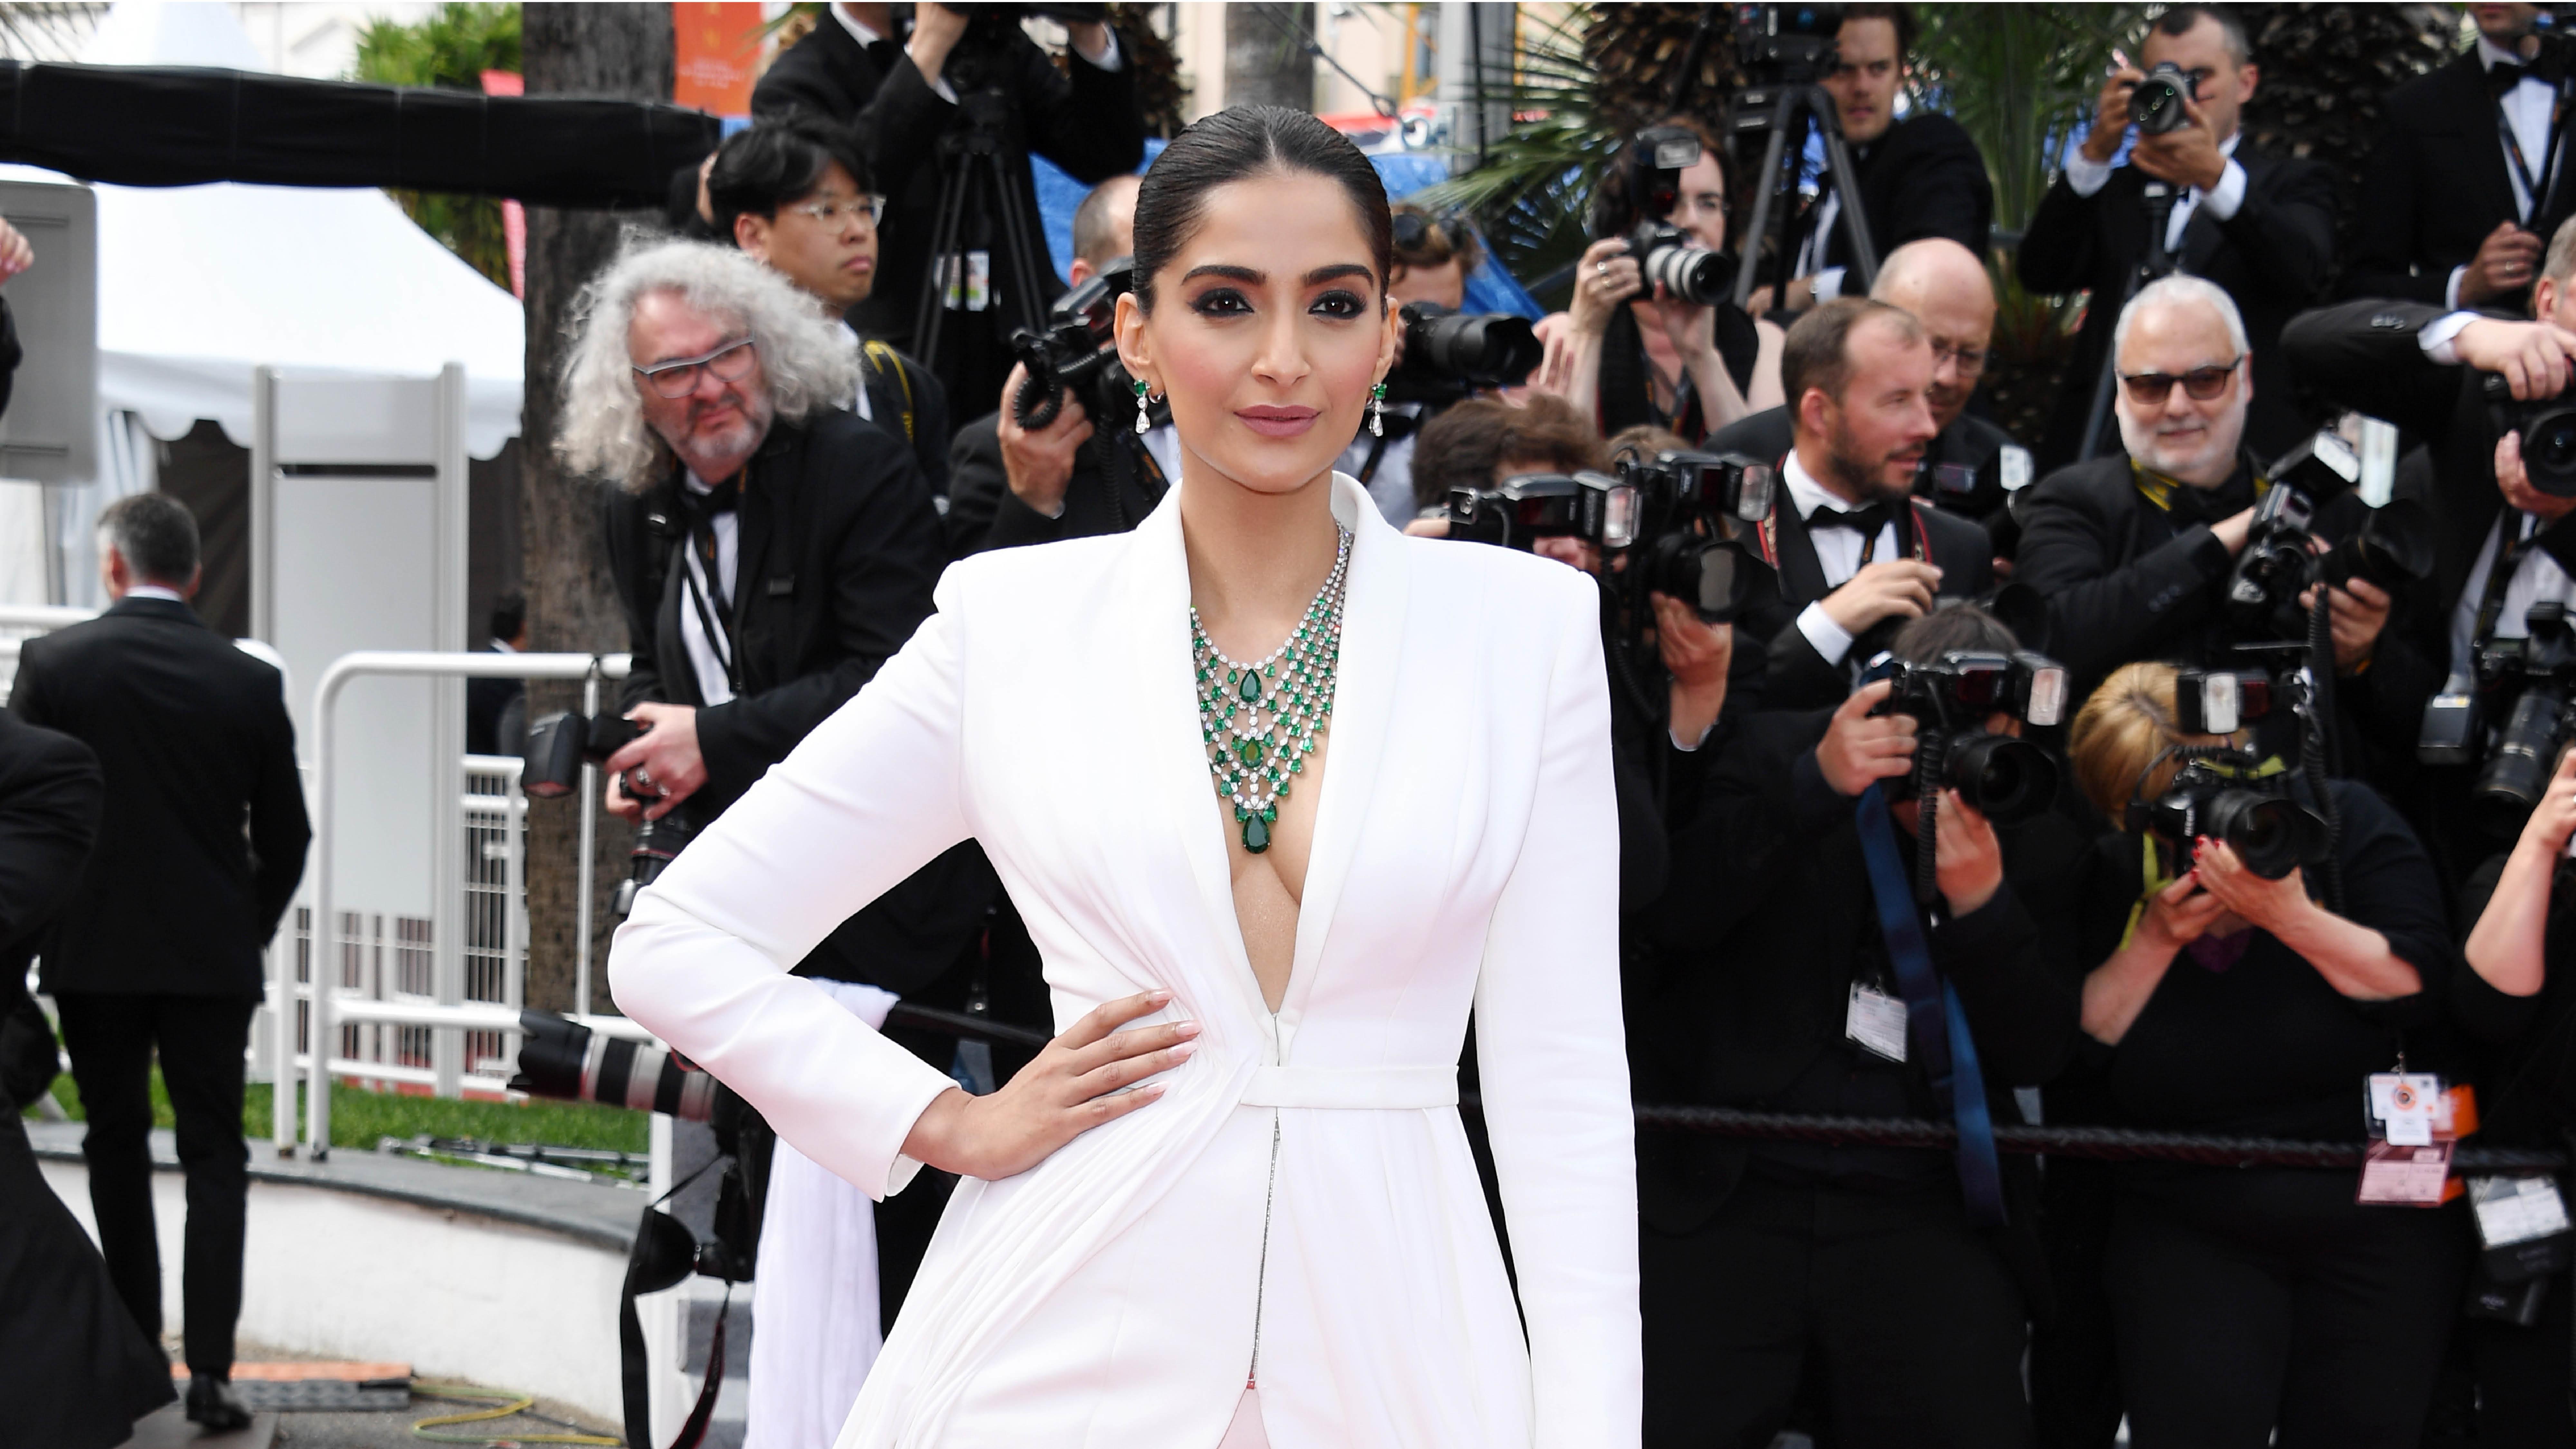 We're Still Swooning Over Sonam Kapoor's White Tuxedo Dress From Cannes